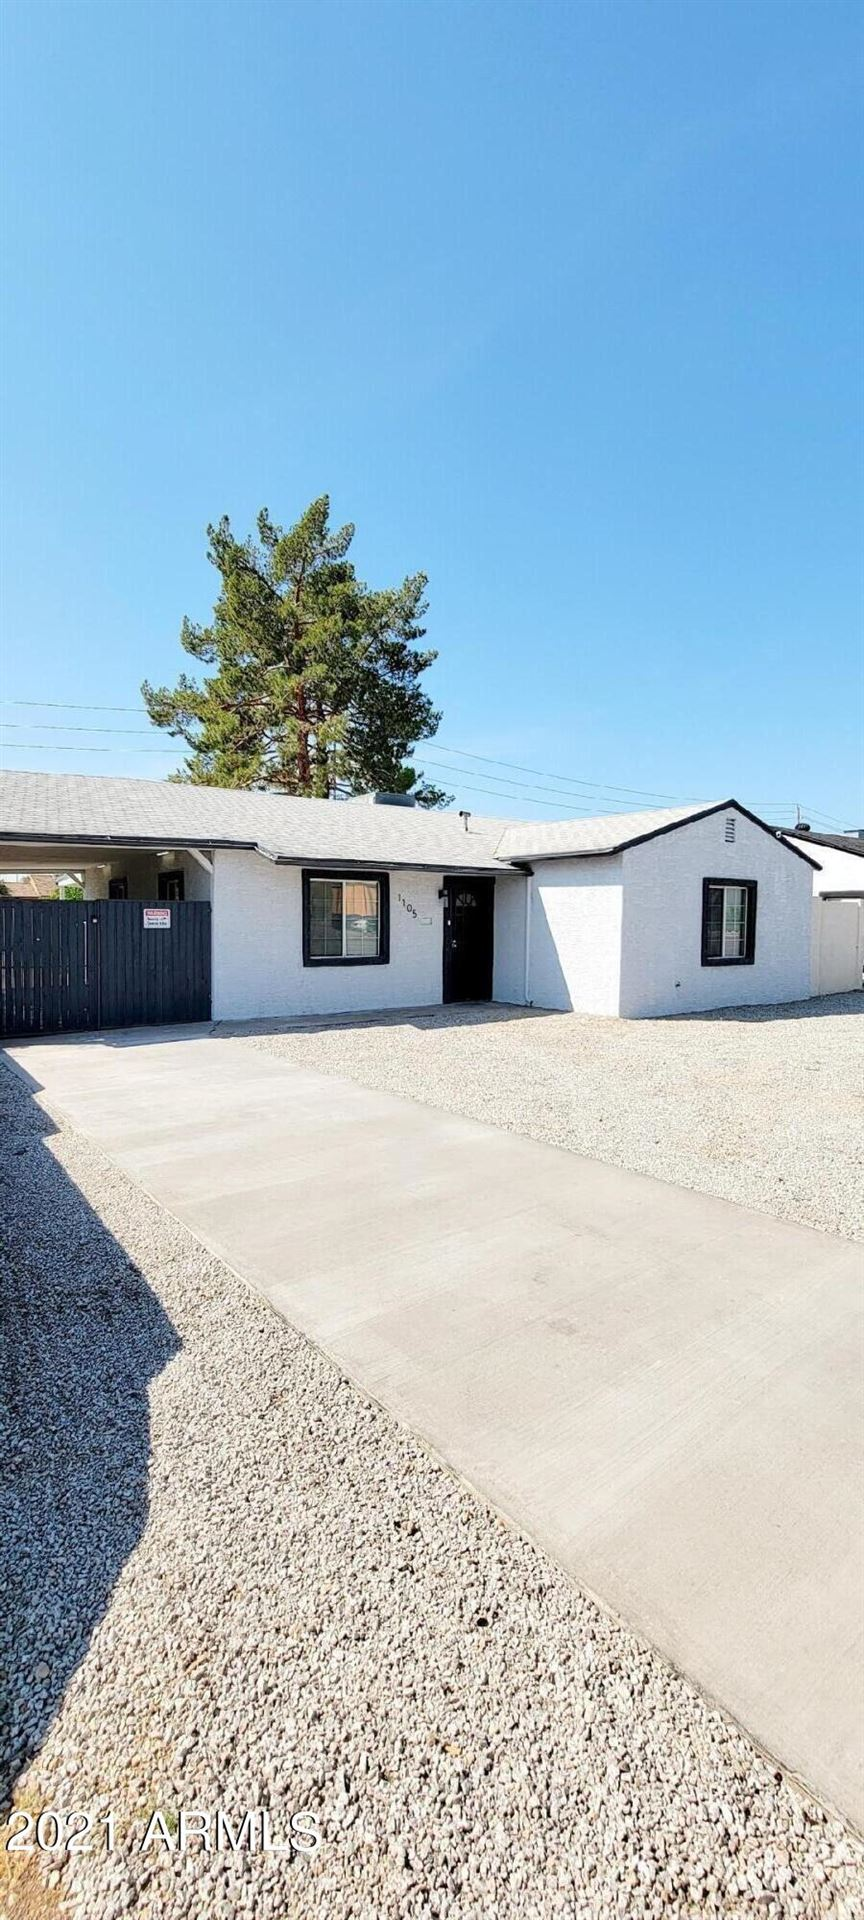 1105 W INDIAN SCHOOL Road, Phoenix, AZ 85013 - MLS#: 6289636